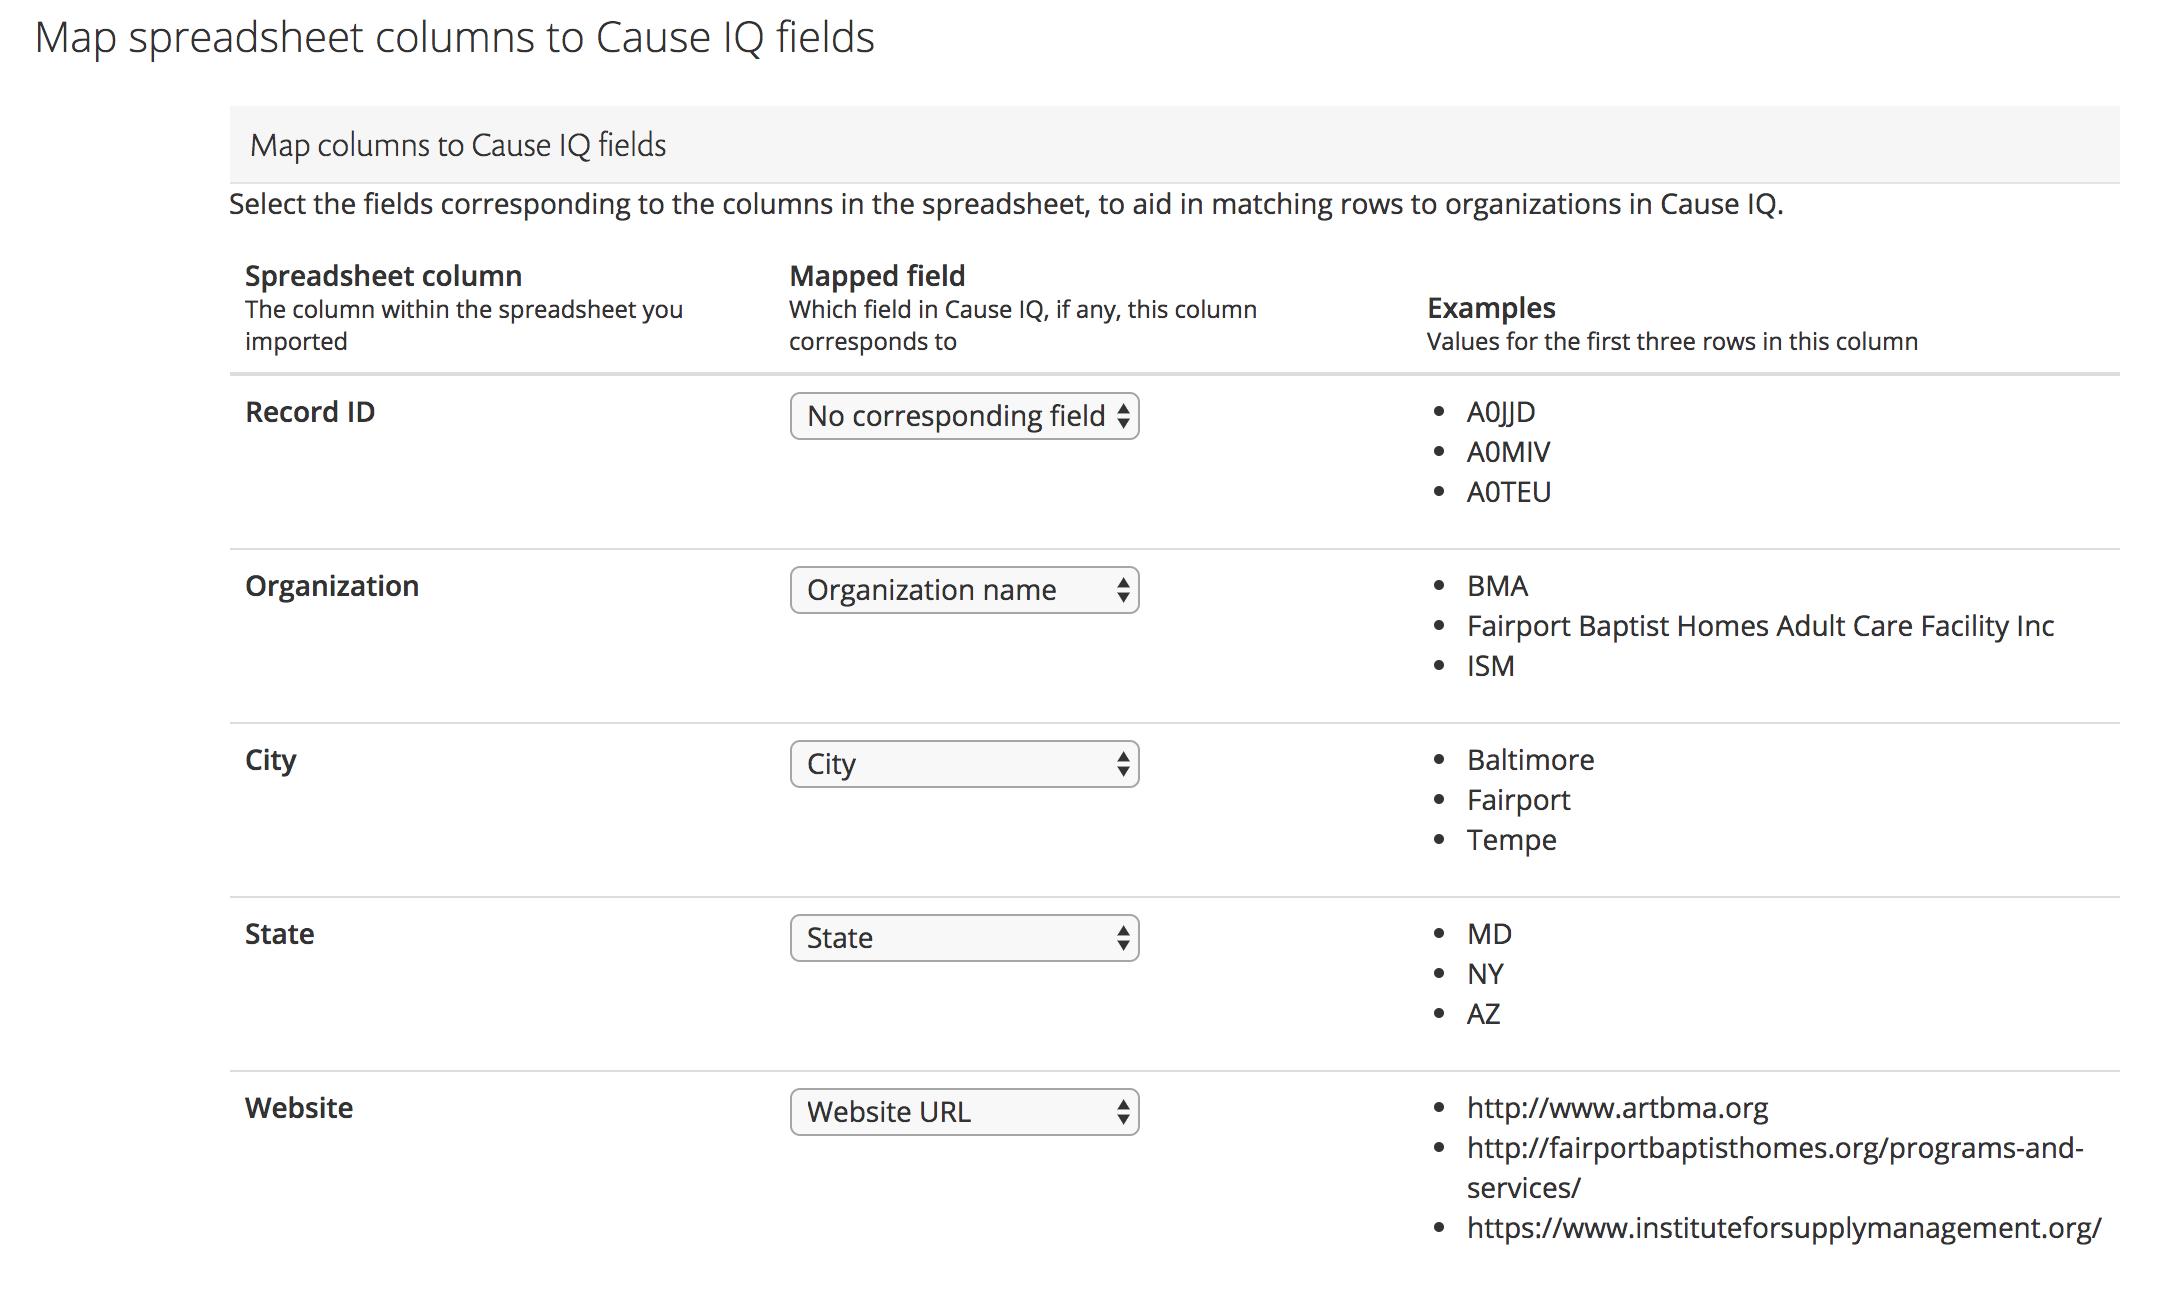 Map spreadsheet columns to Cause IQ fields